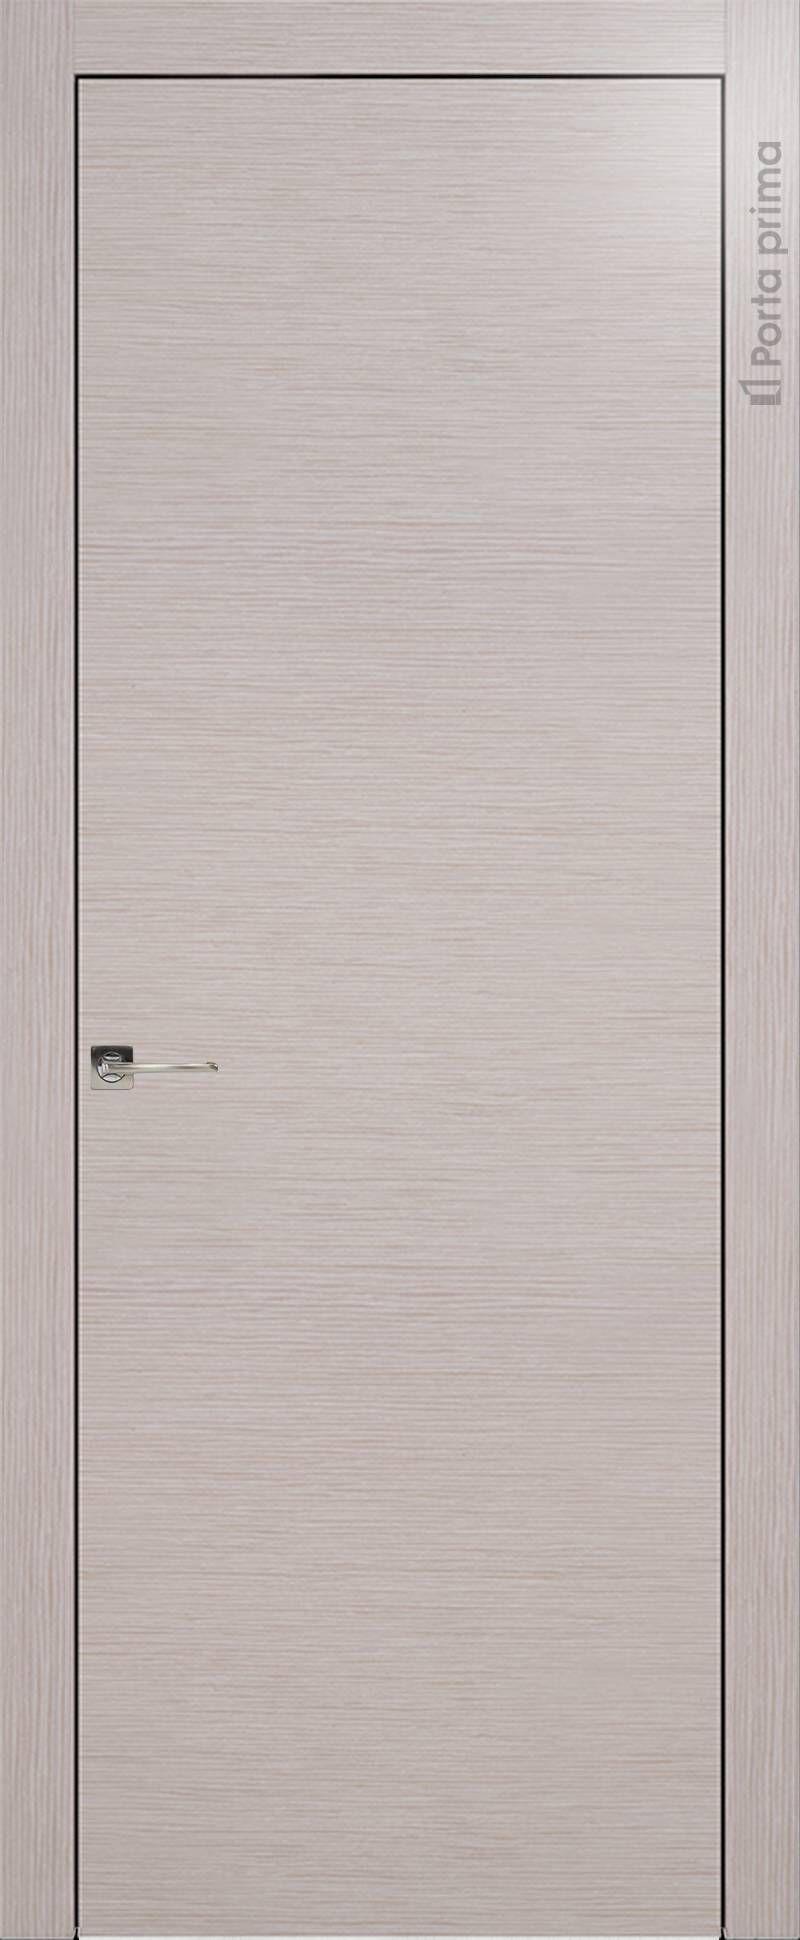 Tivoli А-2 цвет - Дымчатый дуб Без стекла (ДГ)